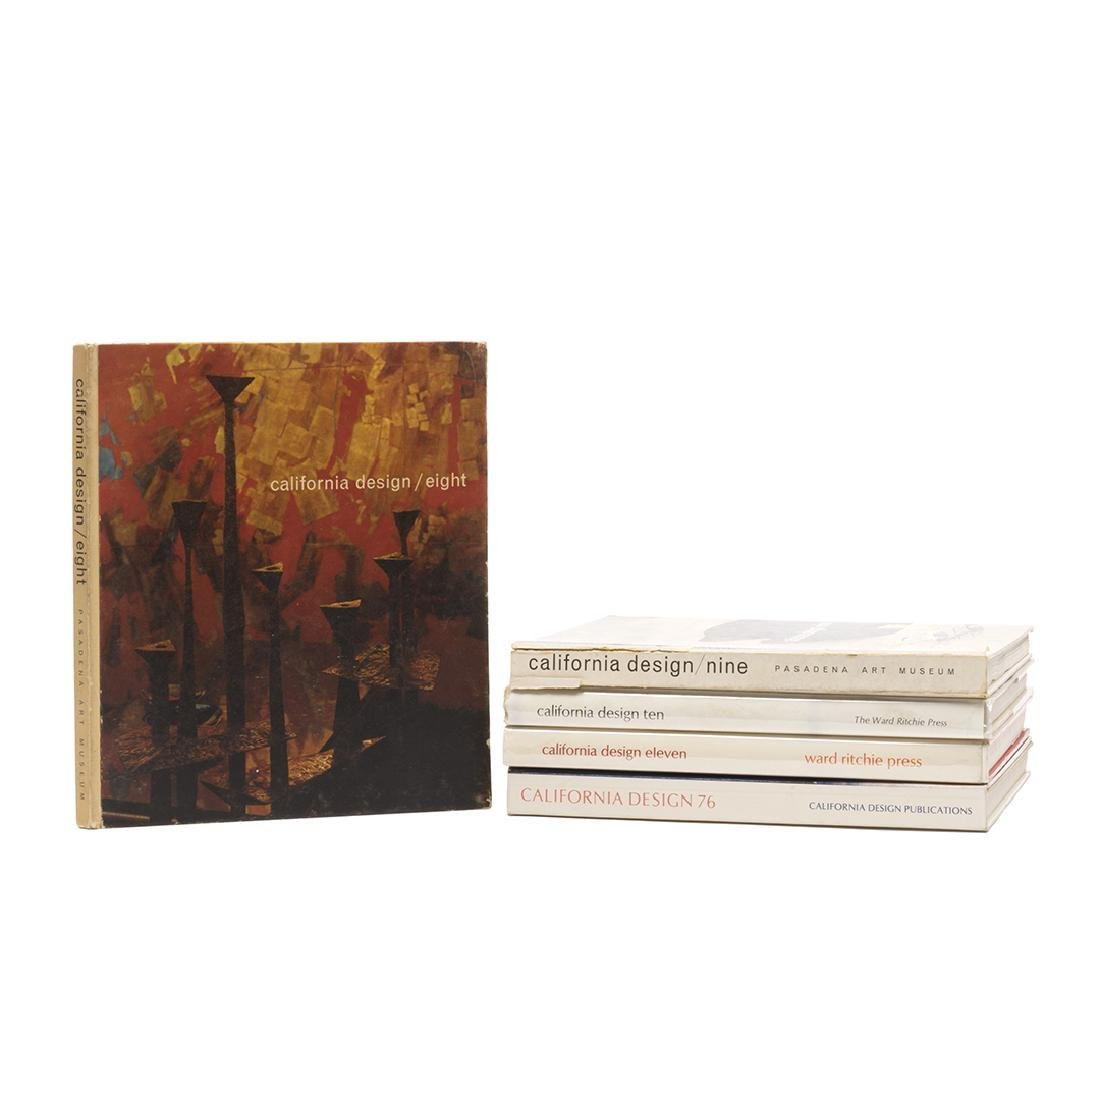 CA Design Catalogs, Complete Set (5)